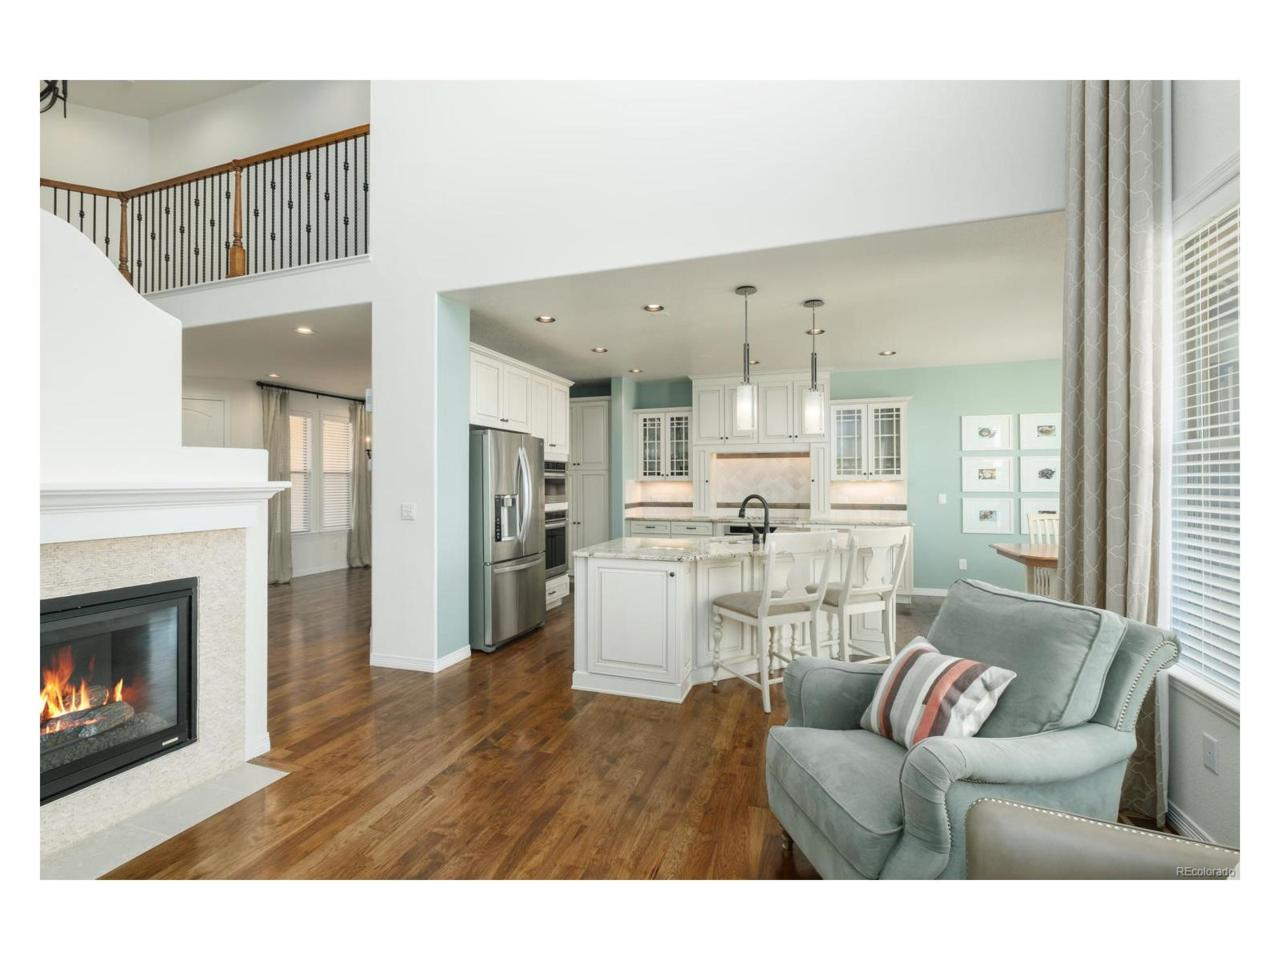 9507 Pendio Court, Highlands Ranch, CO 80126 (MLS #9371955) :: 8z Real Estate